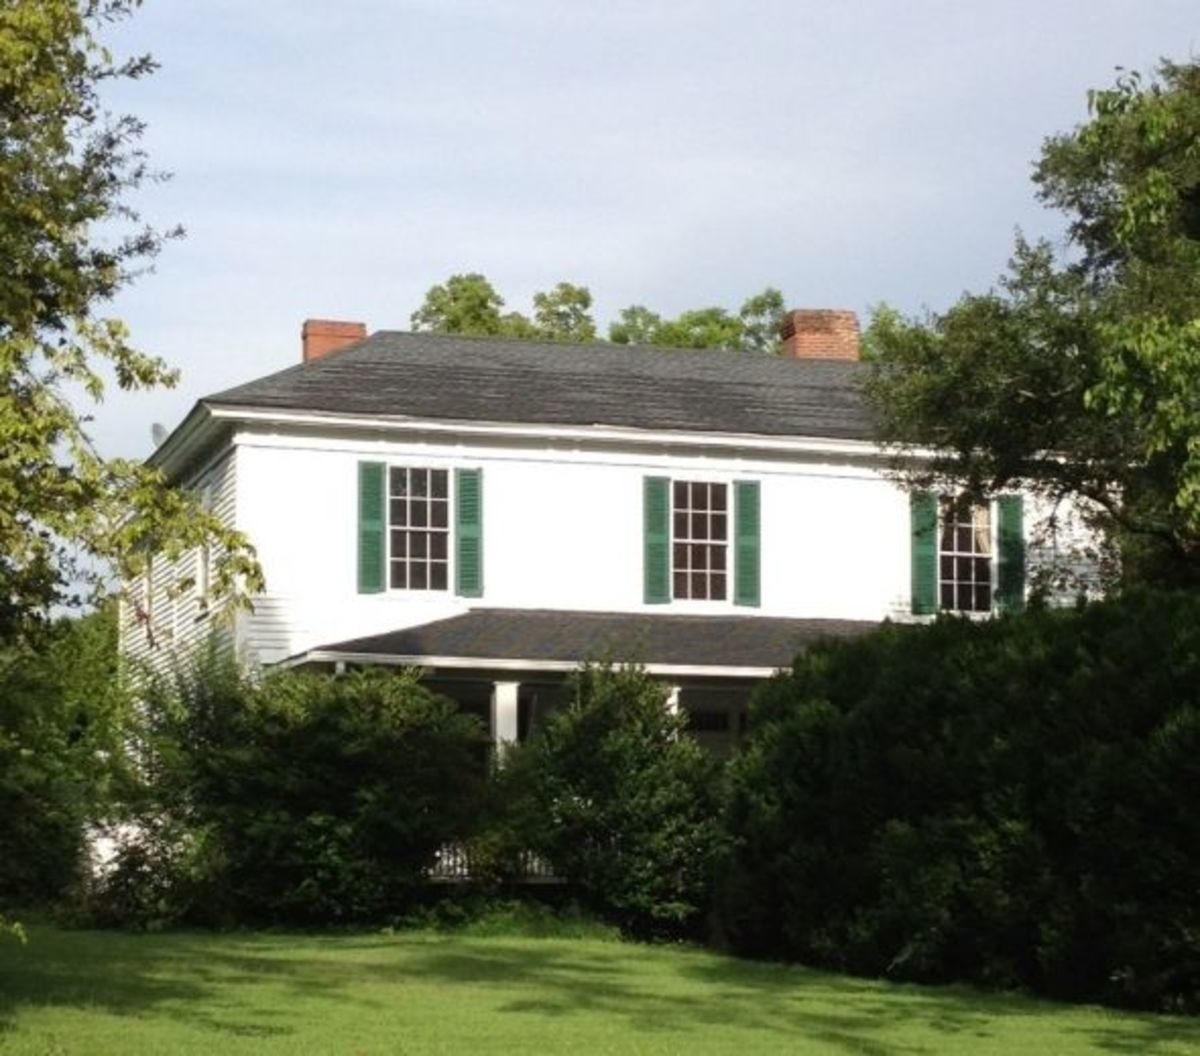 Poe House in Pendleton SC